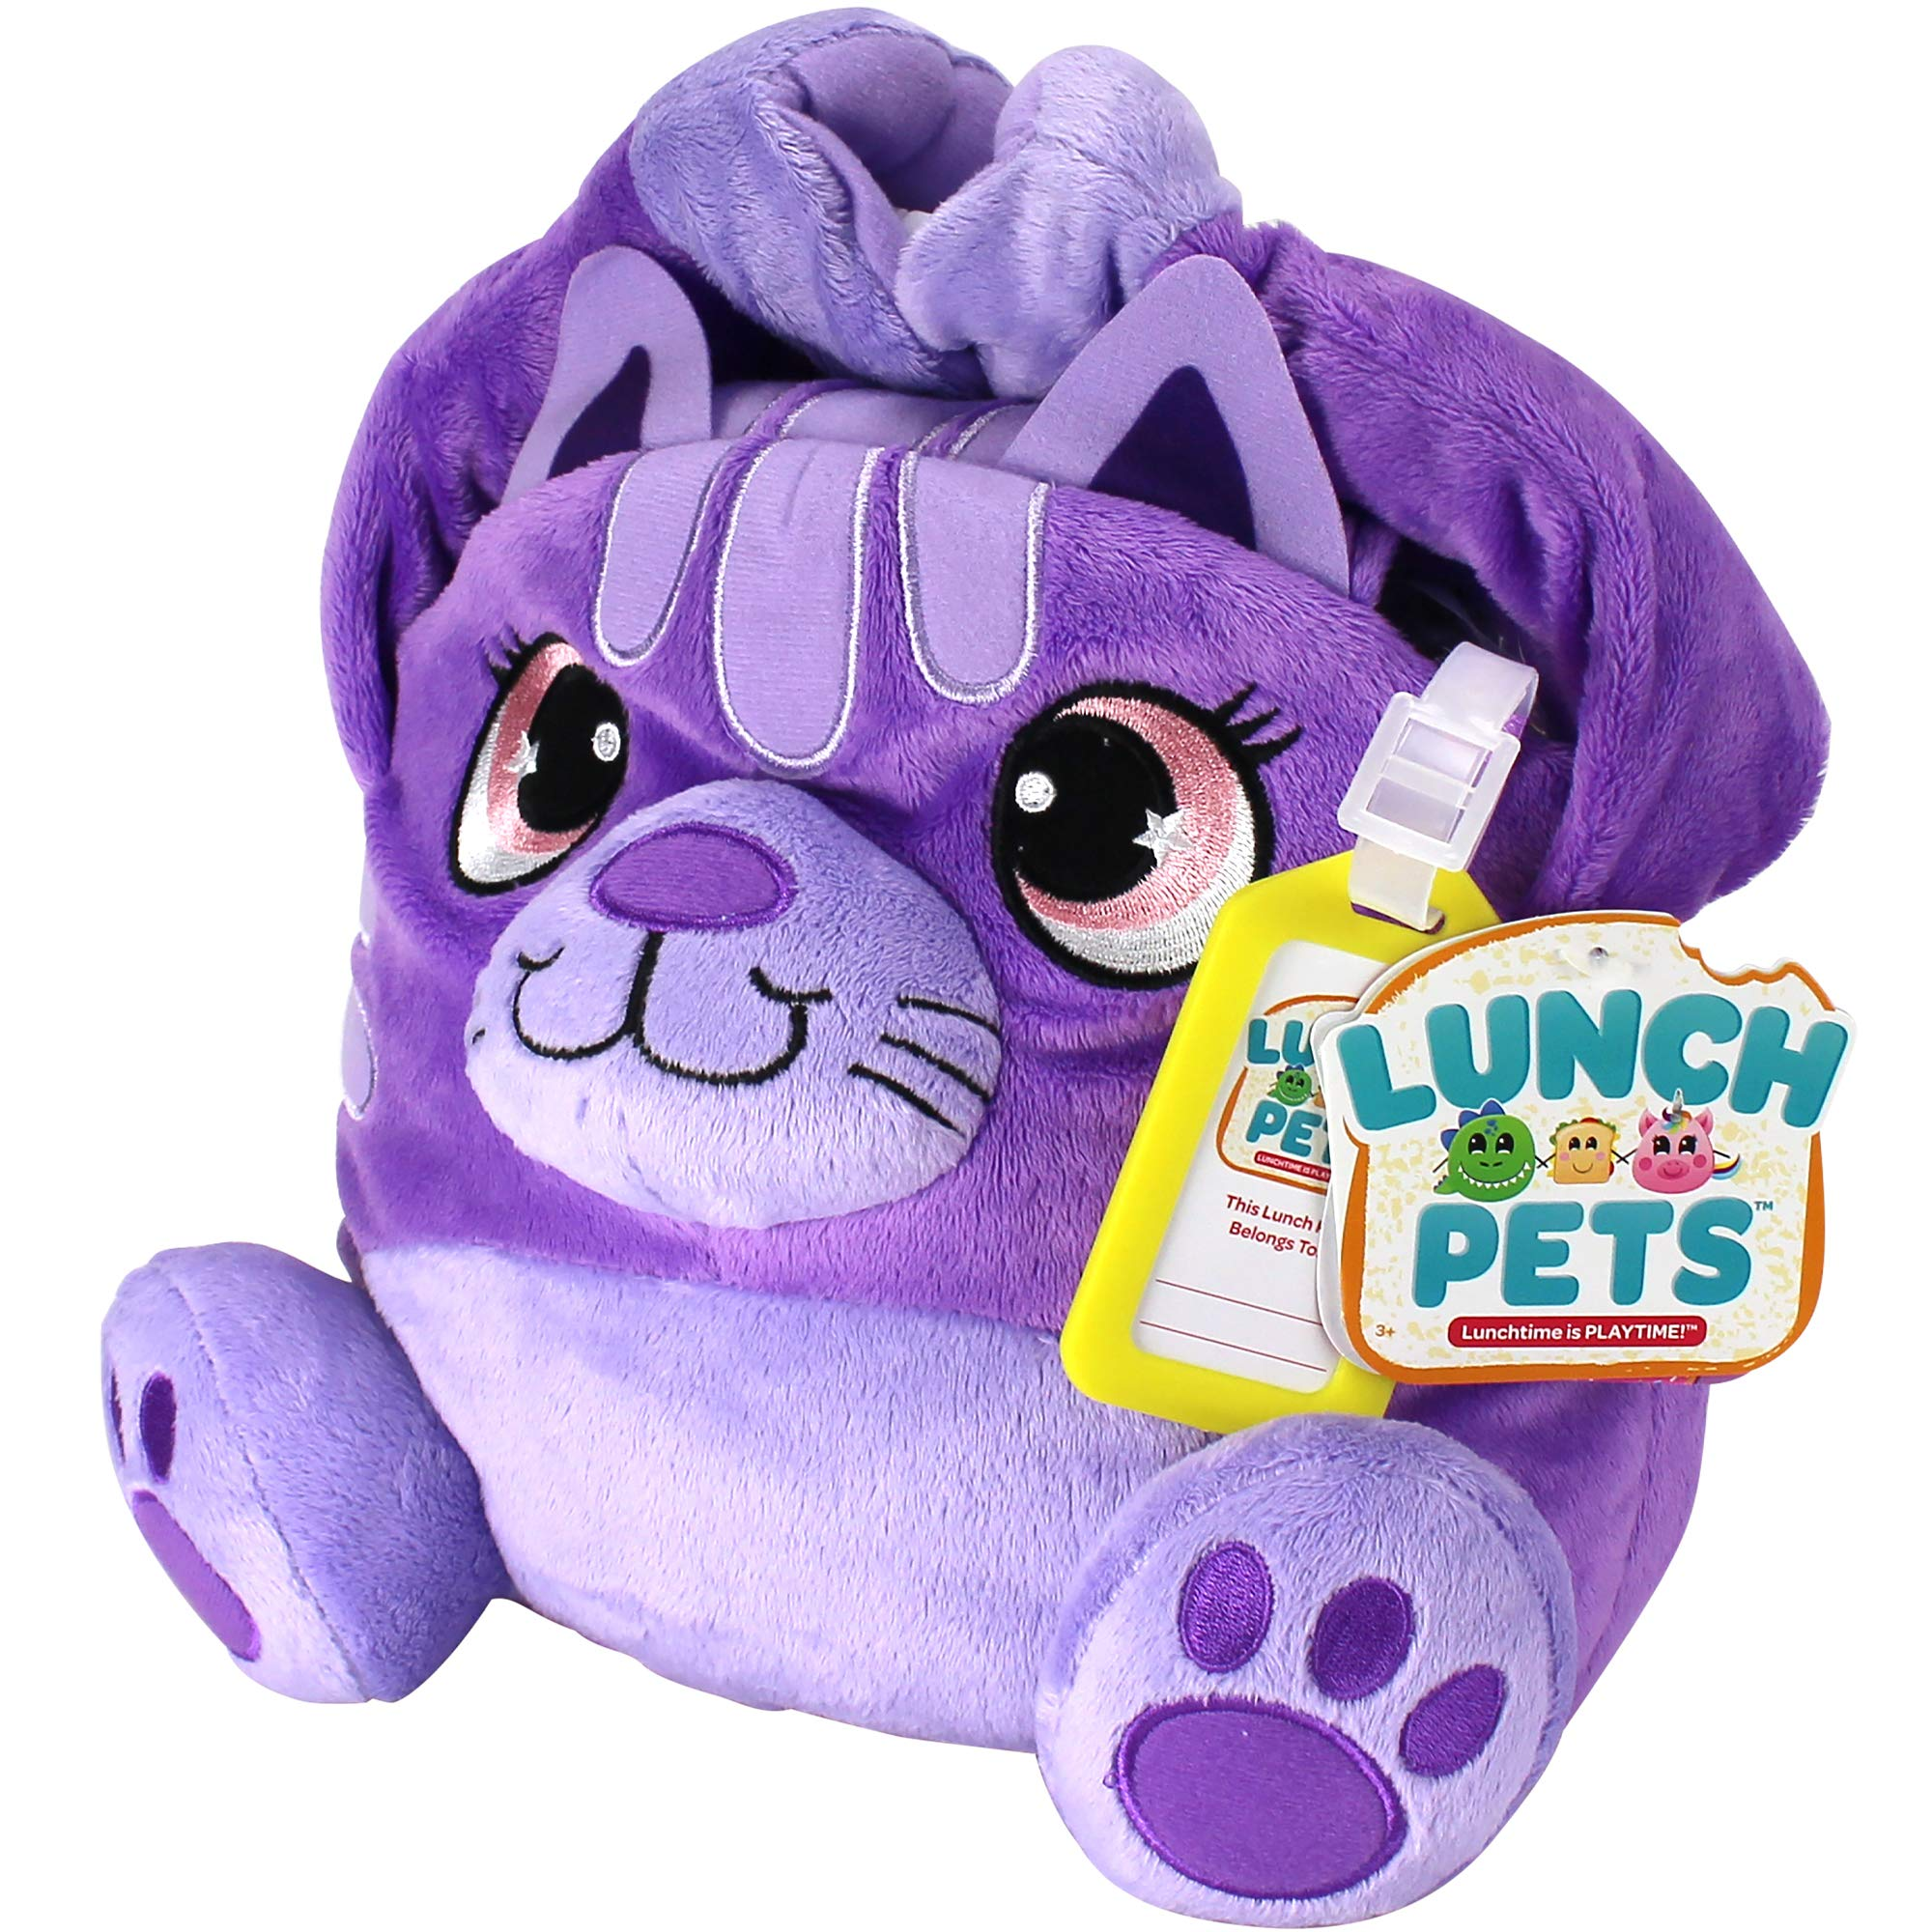 Lunch Pets Amazing, Plush Animal Combination – SnackyCat Style Kids Lunch Box, Travel Size, Purple